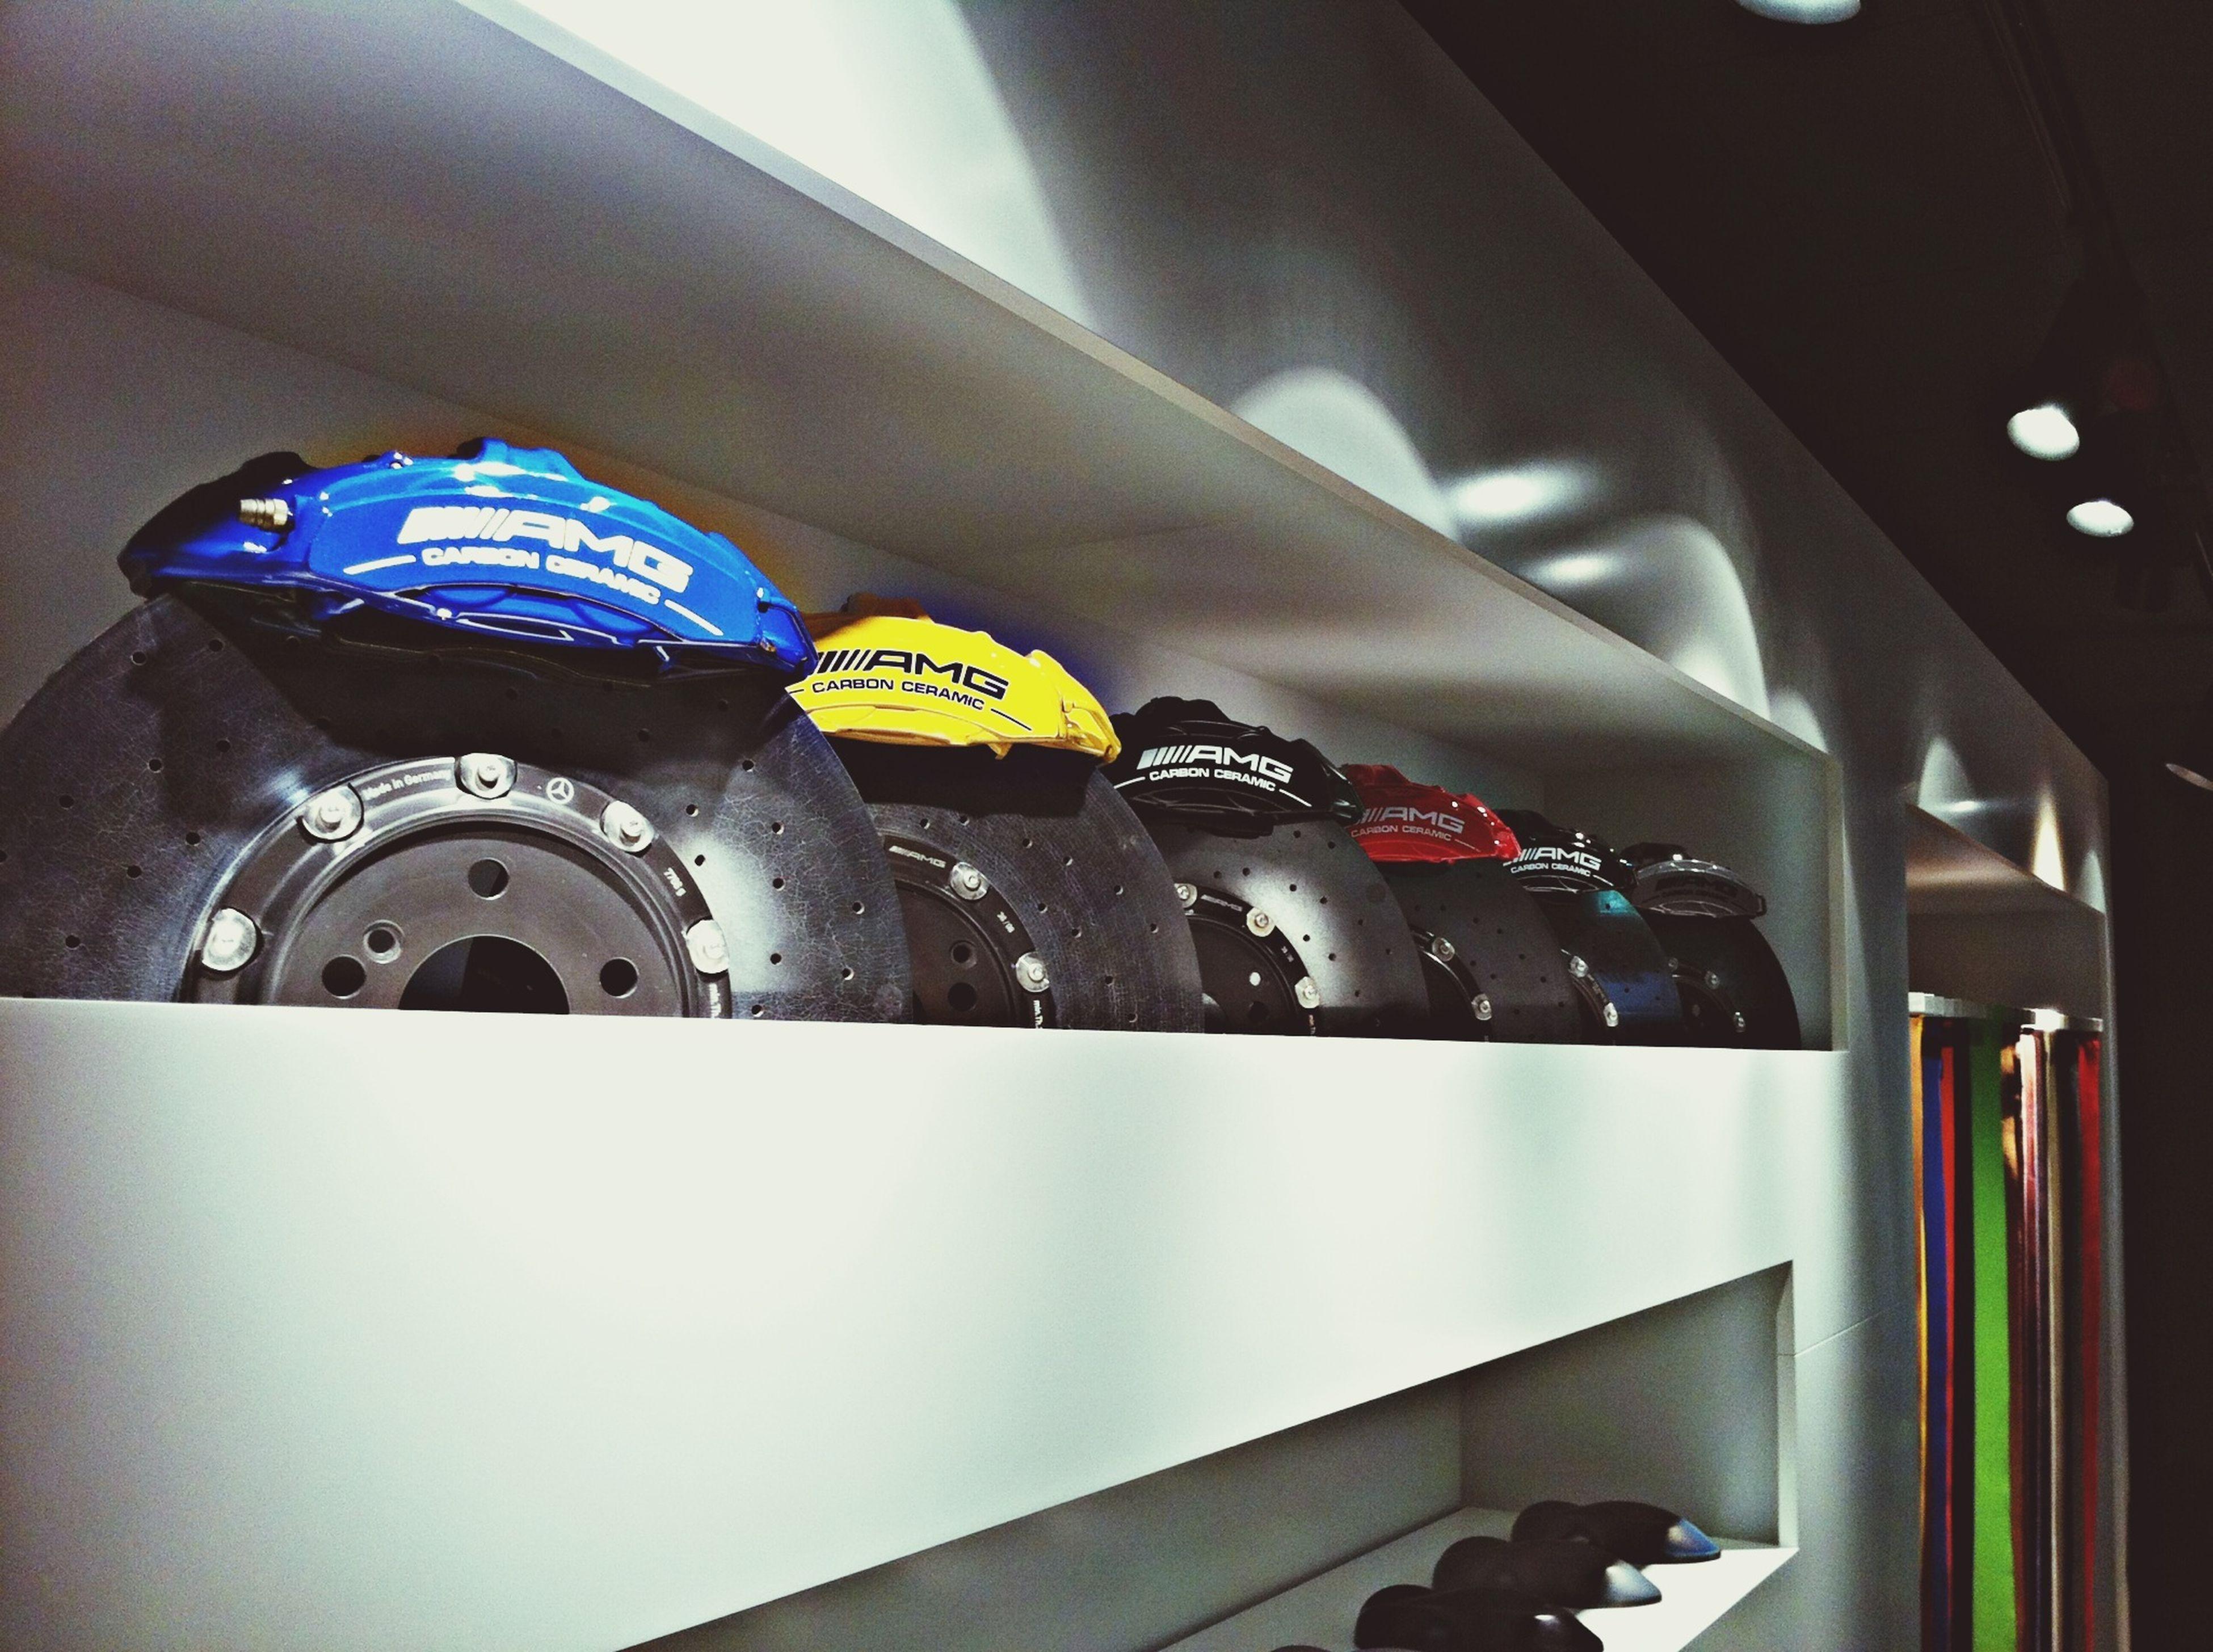 Coloured Brakes